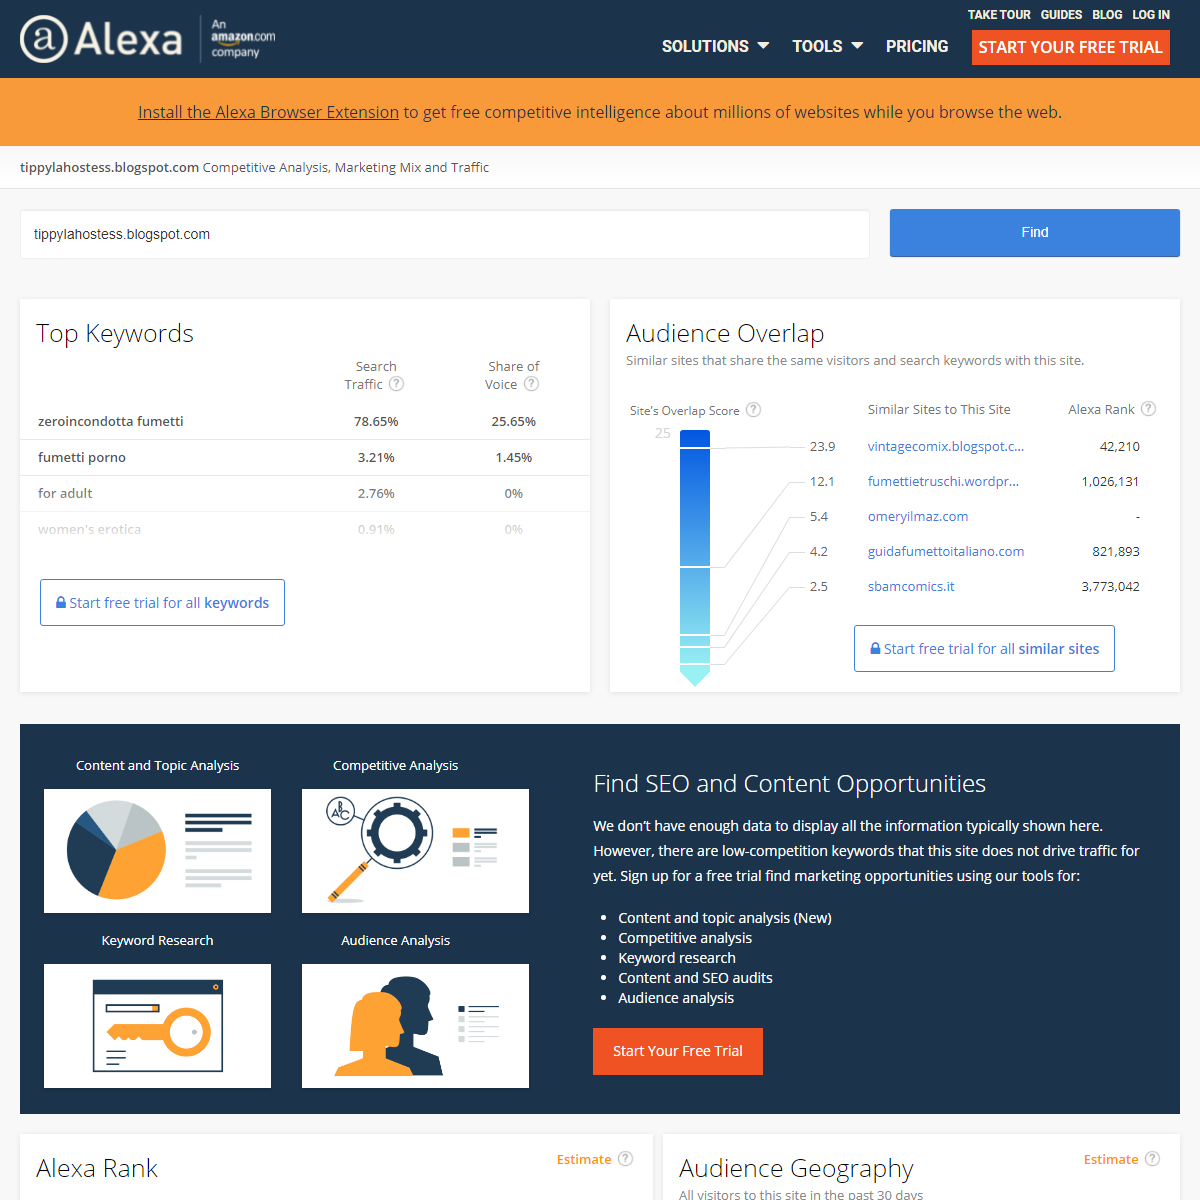 tippylahostess.blogspot.com Competitive Analysis, Marketing Mix and Traffic - Alexa